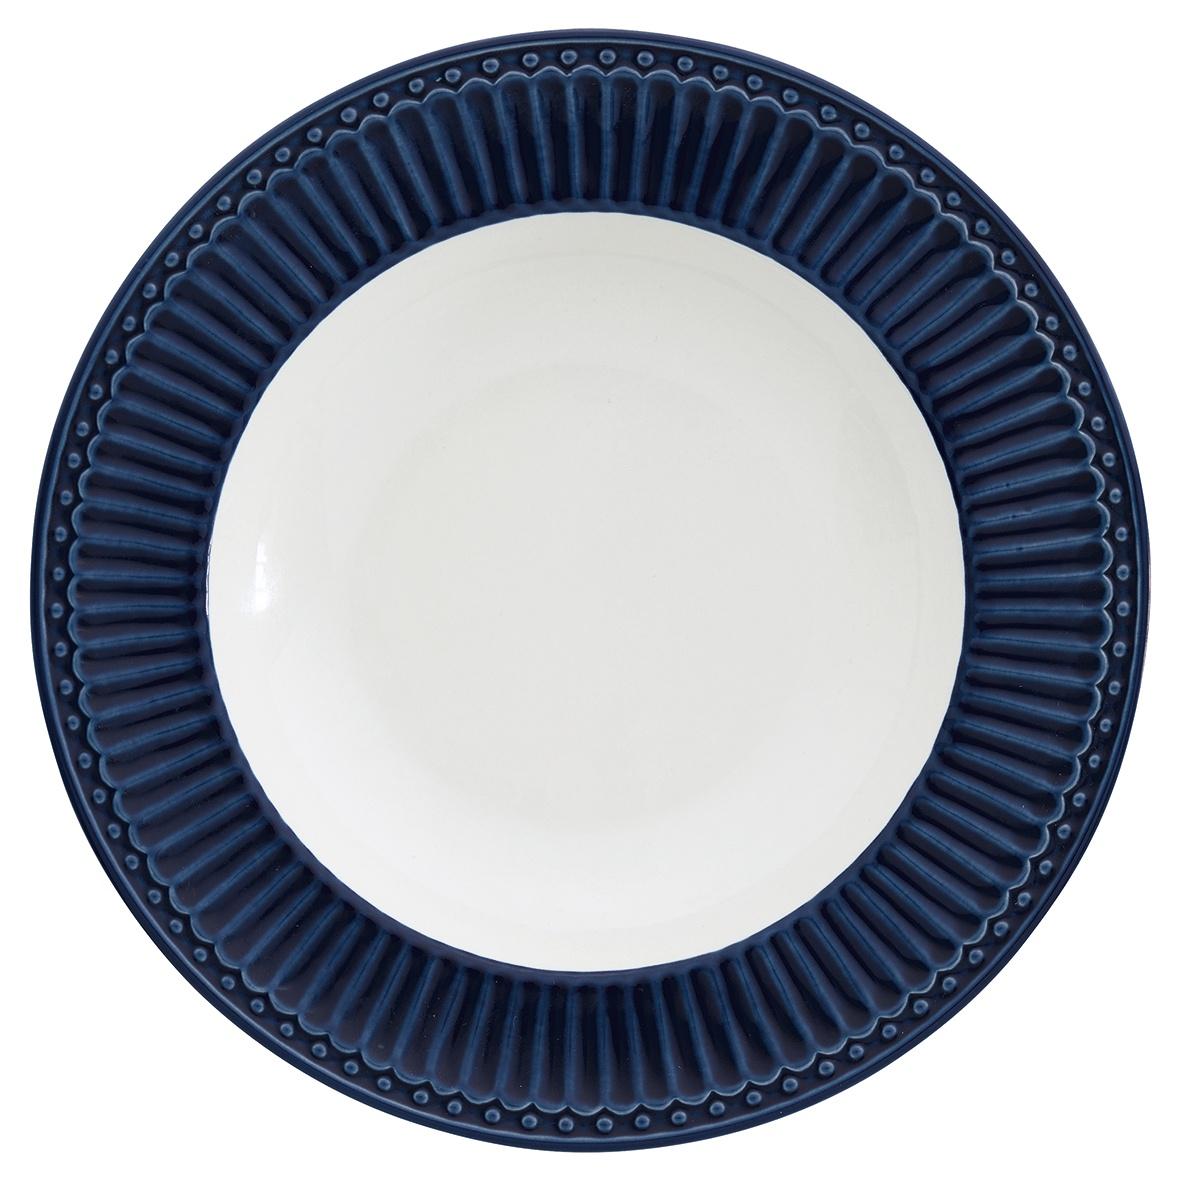 Глубокая тарелка Greengate Alice dark blue 21,5 см